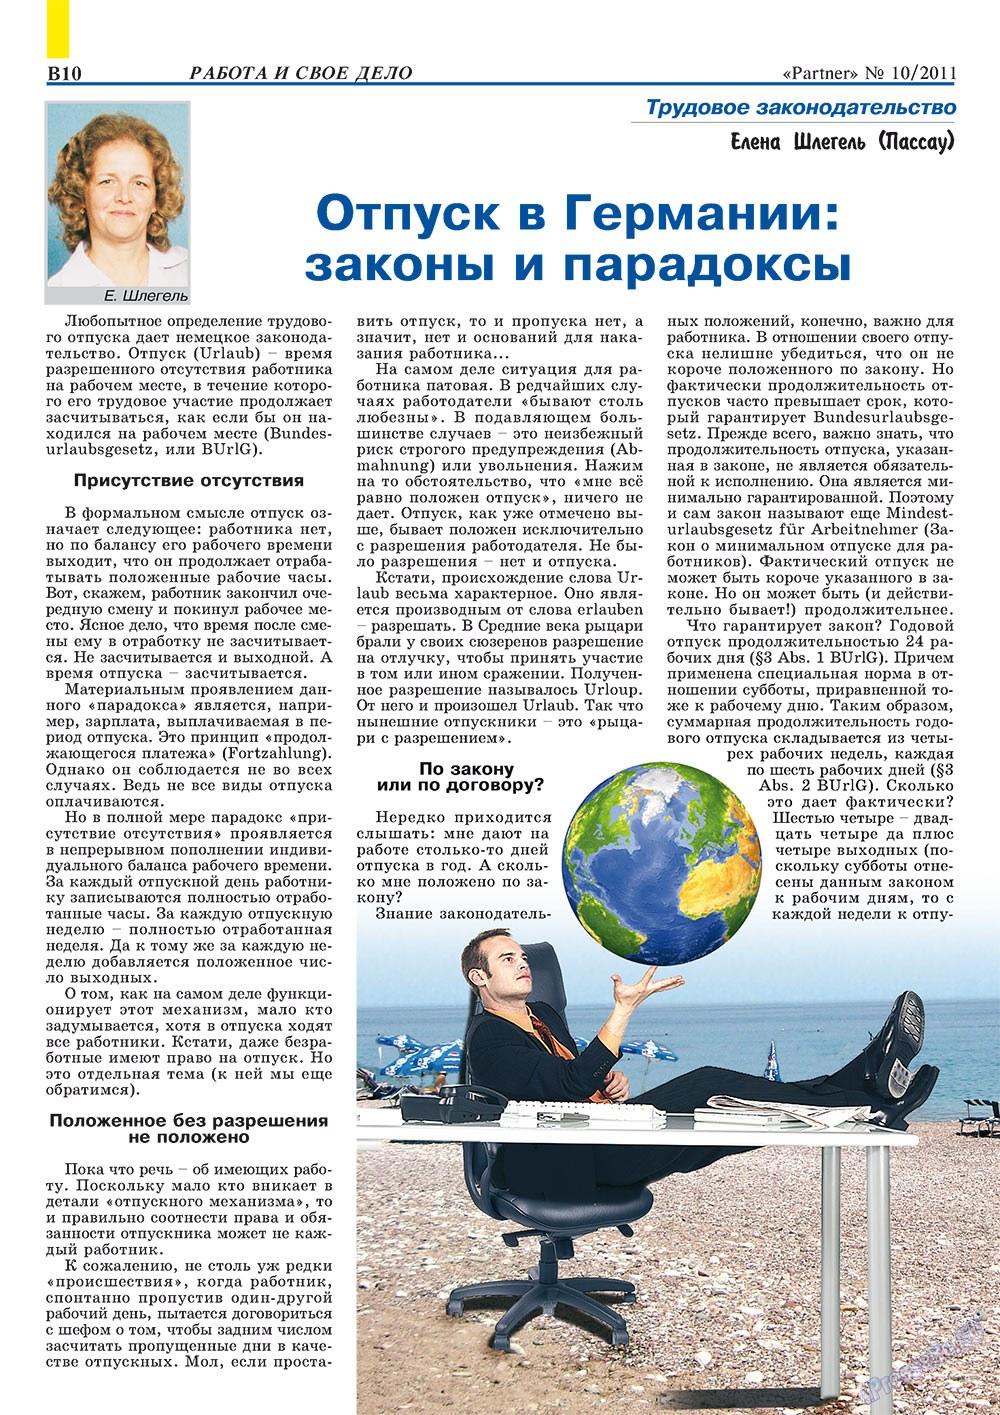 Партнер-север (журнал). 2011 год, номер 10, стр. 20